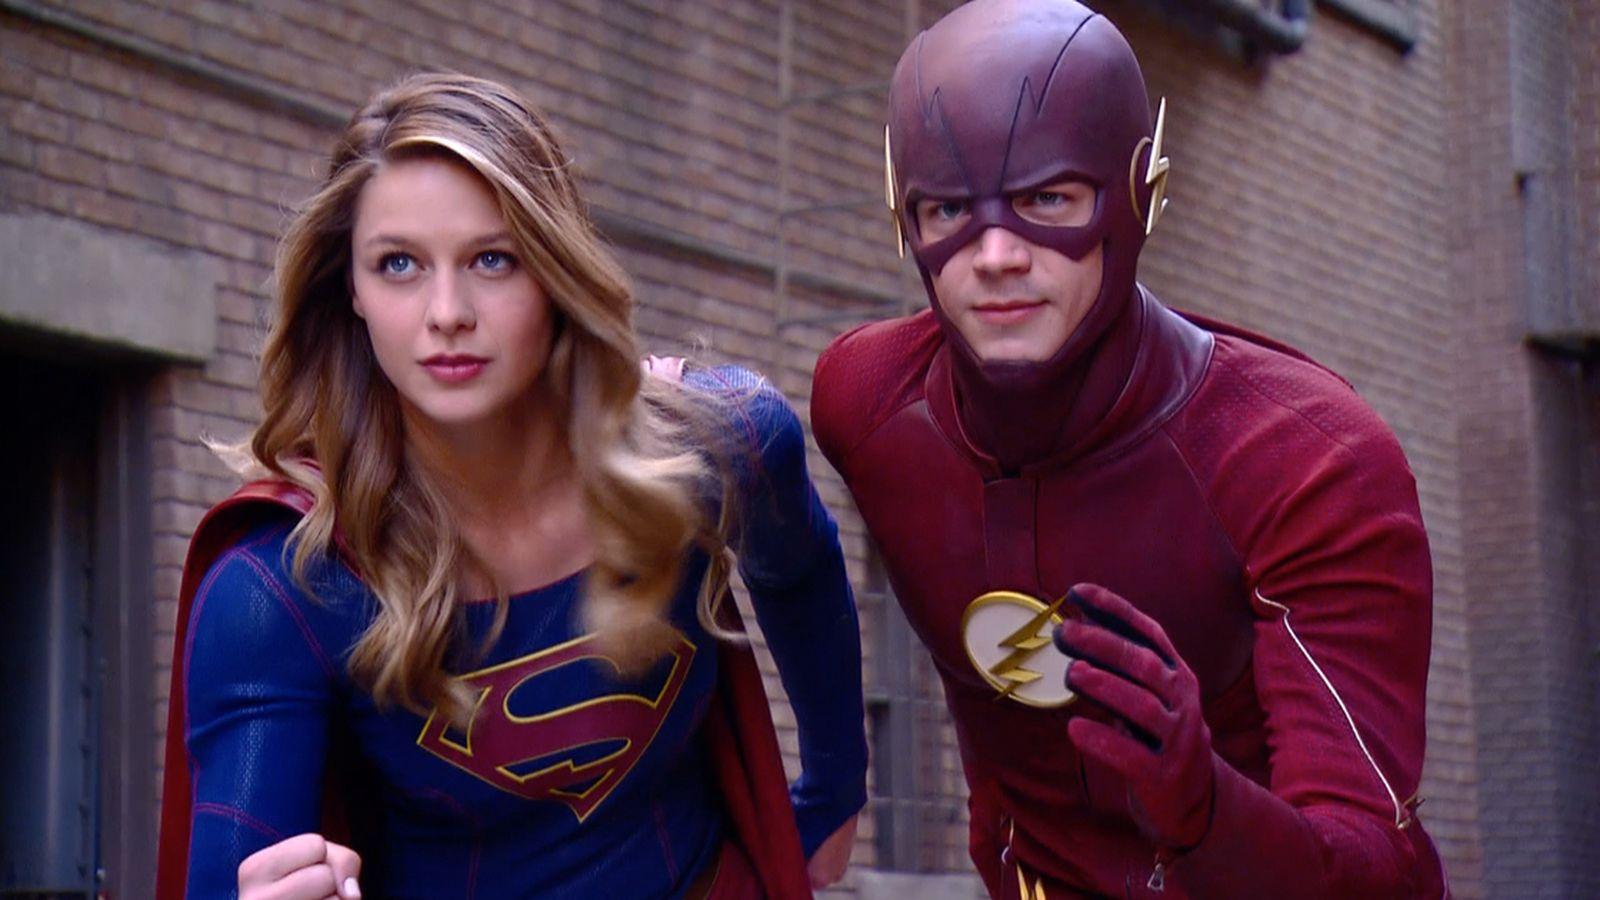 supergirl-vs-the-flash-tv